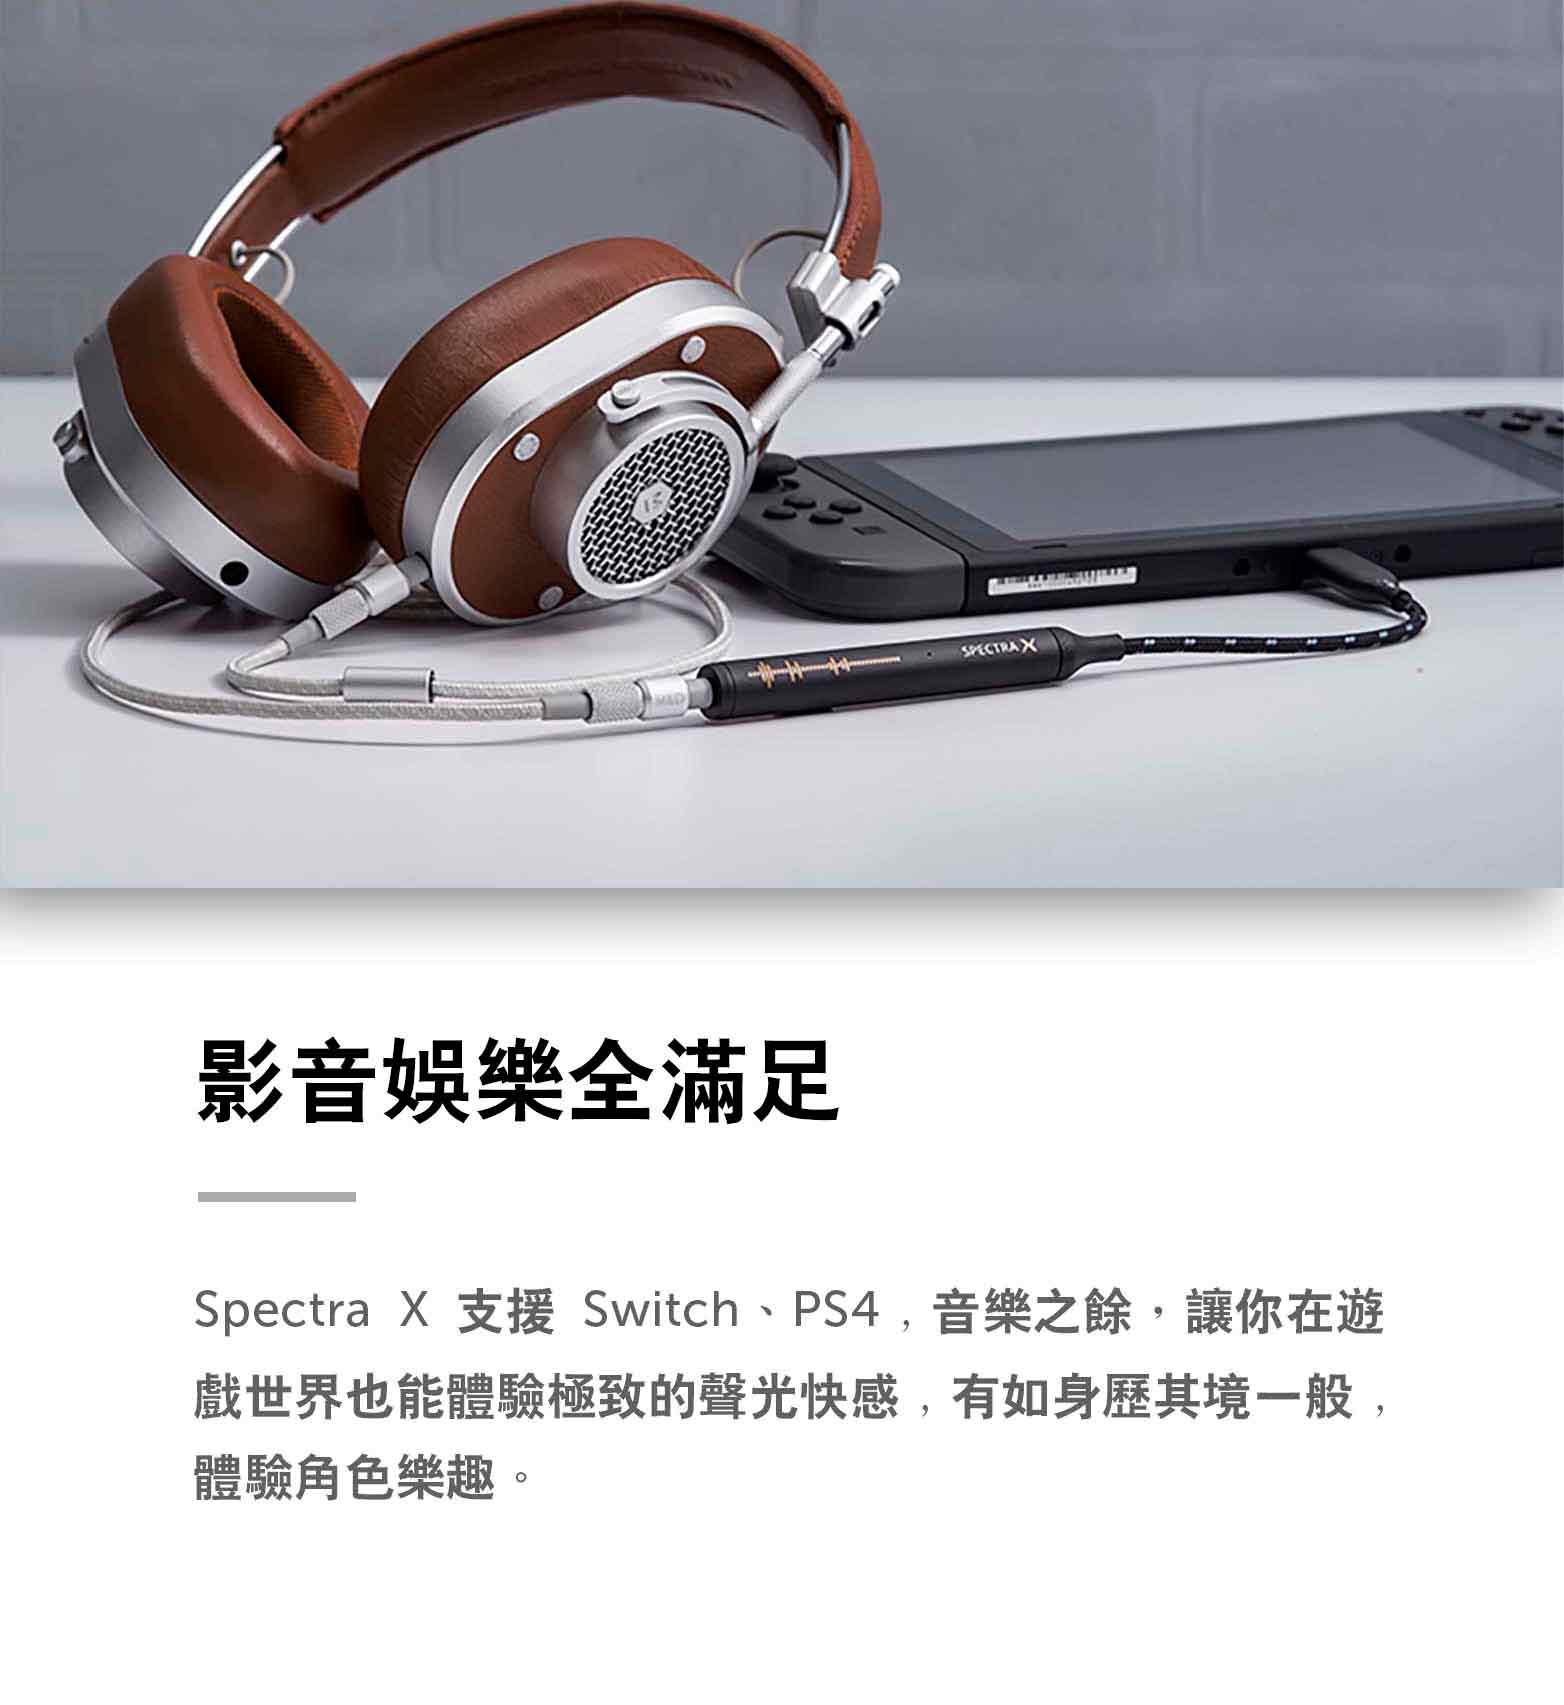 Spectra_X_美聲驅動引擎_智慧音效引擎 6